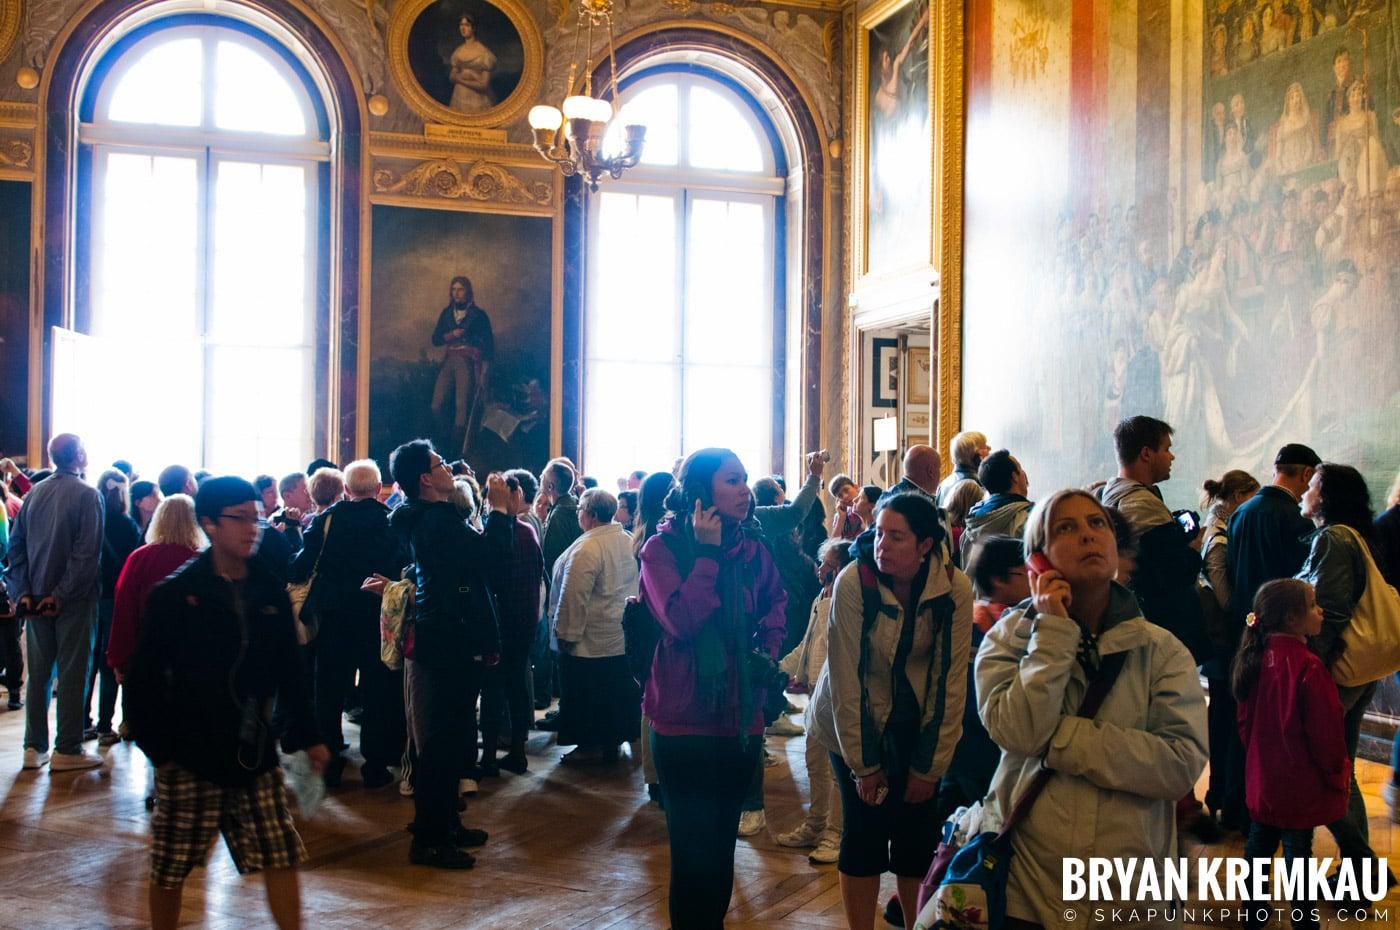 Paris, France Honeymoon - Day 2 - 7.19.11 (23)